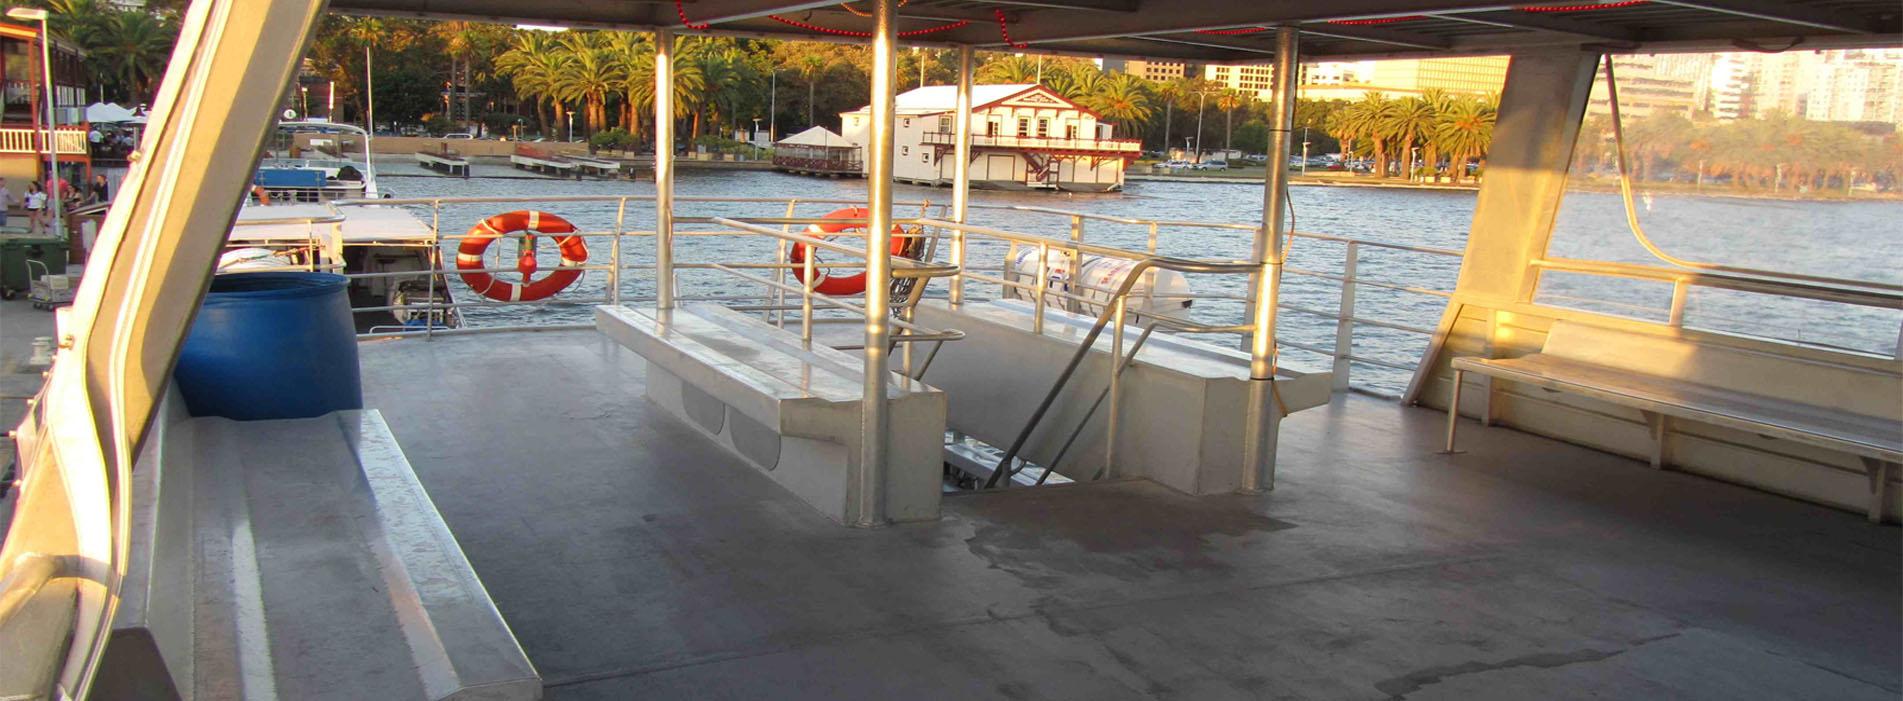 LIONFISH IV charters perth upper deck